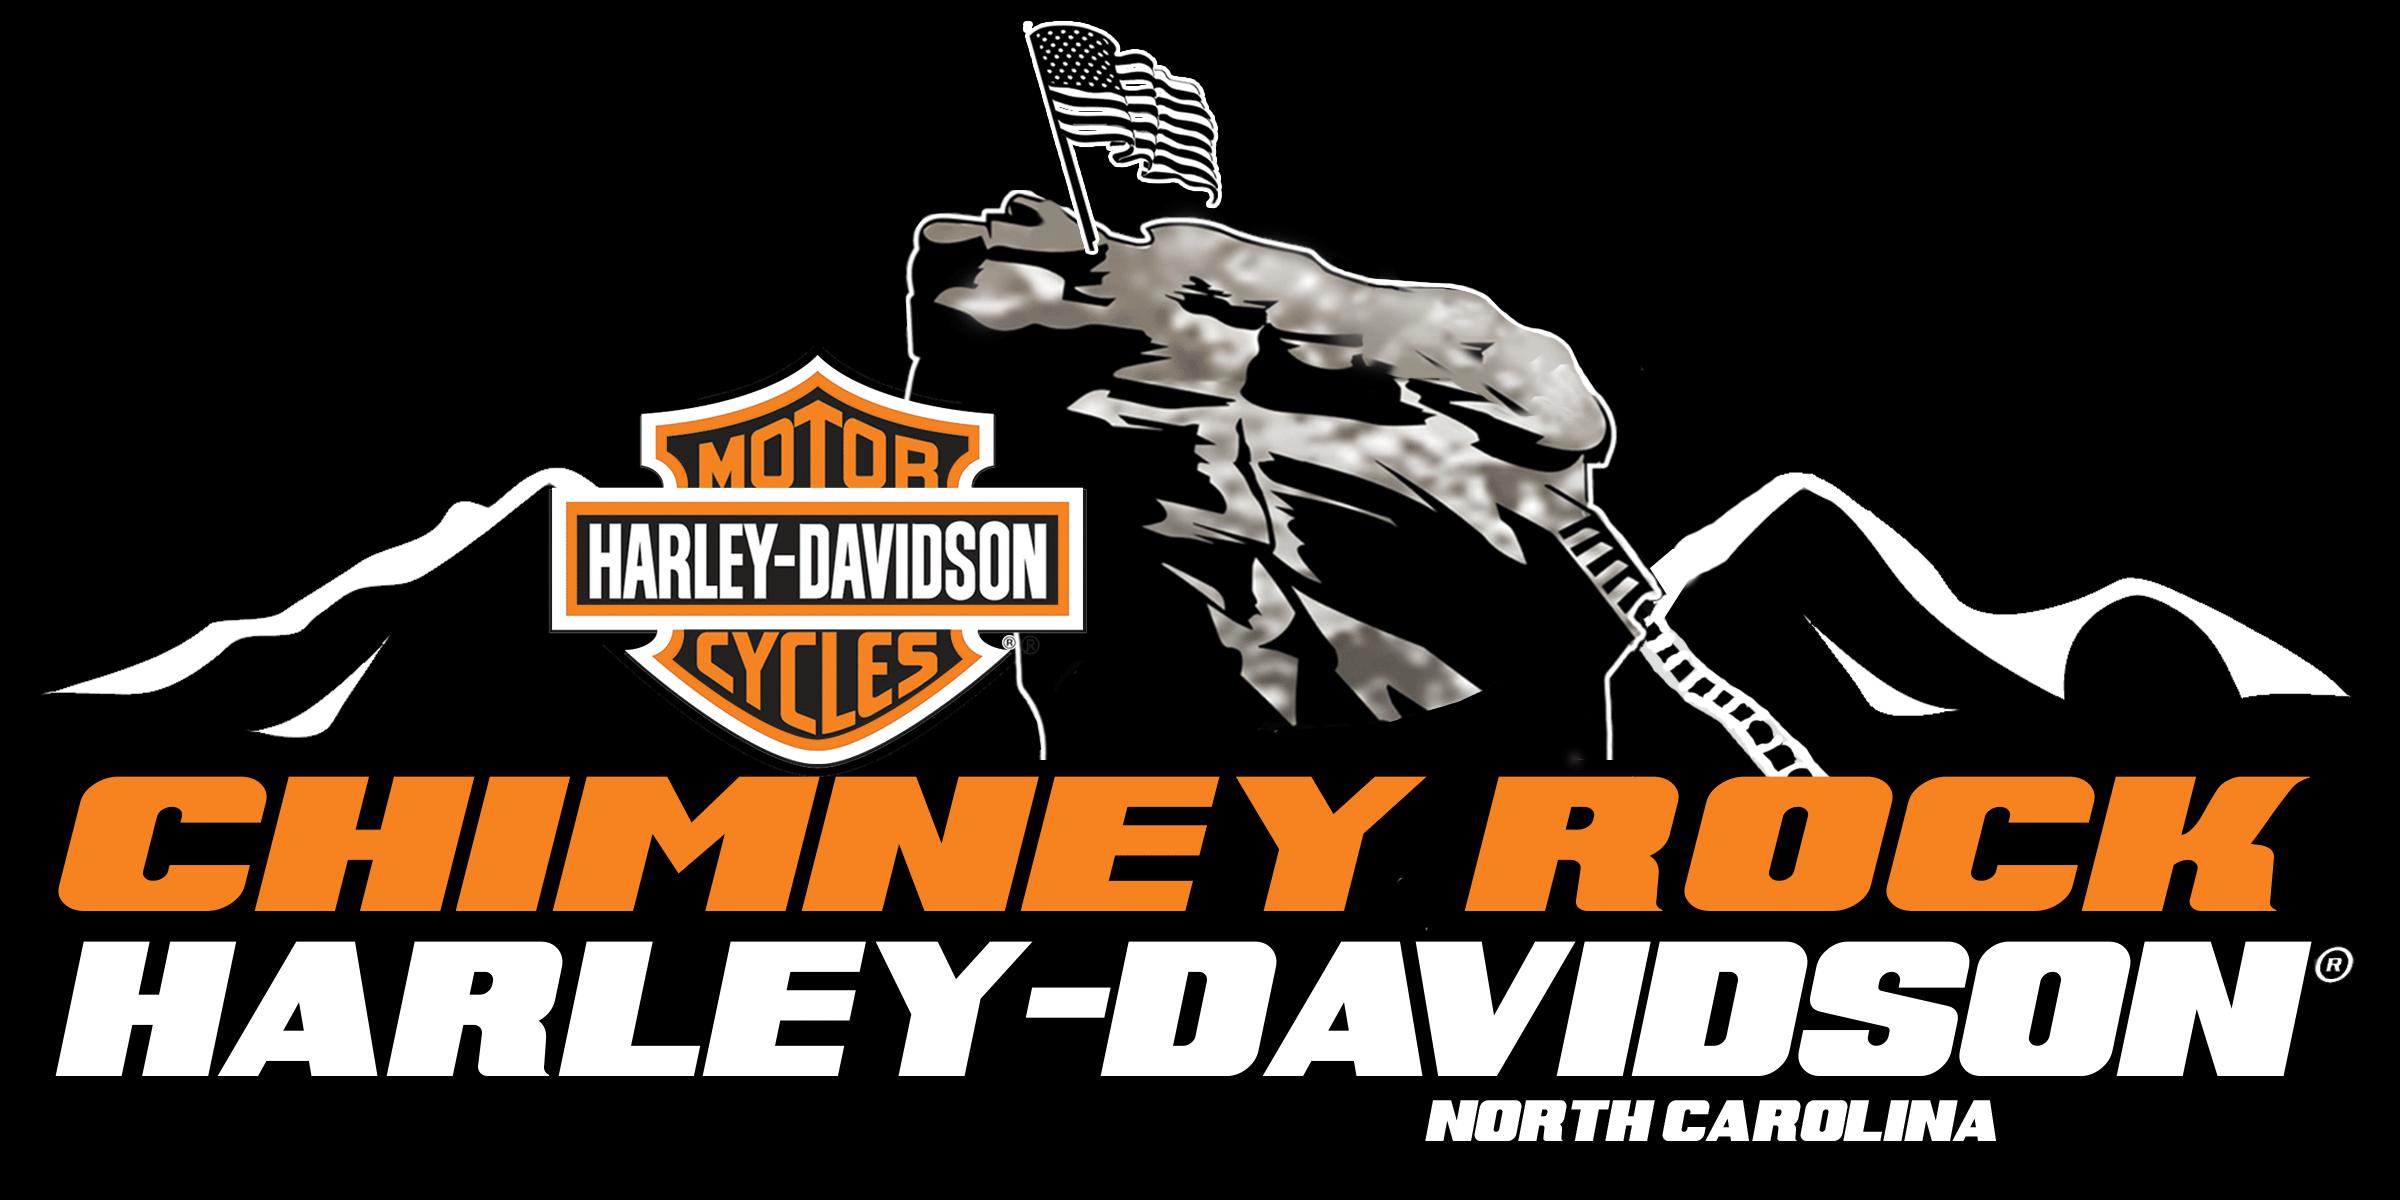 Chimney Rock Harley-Davidson